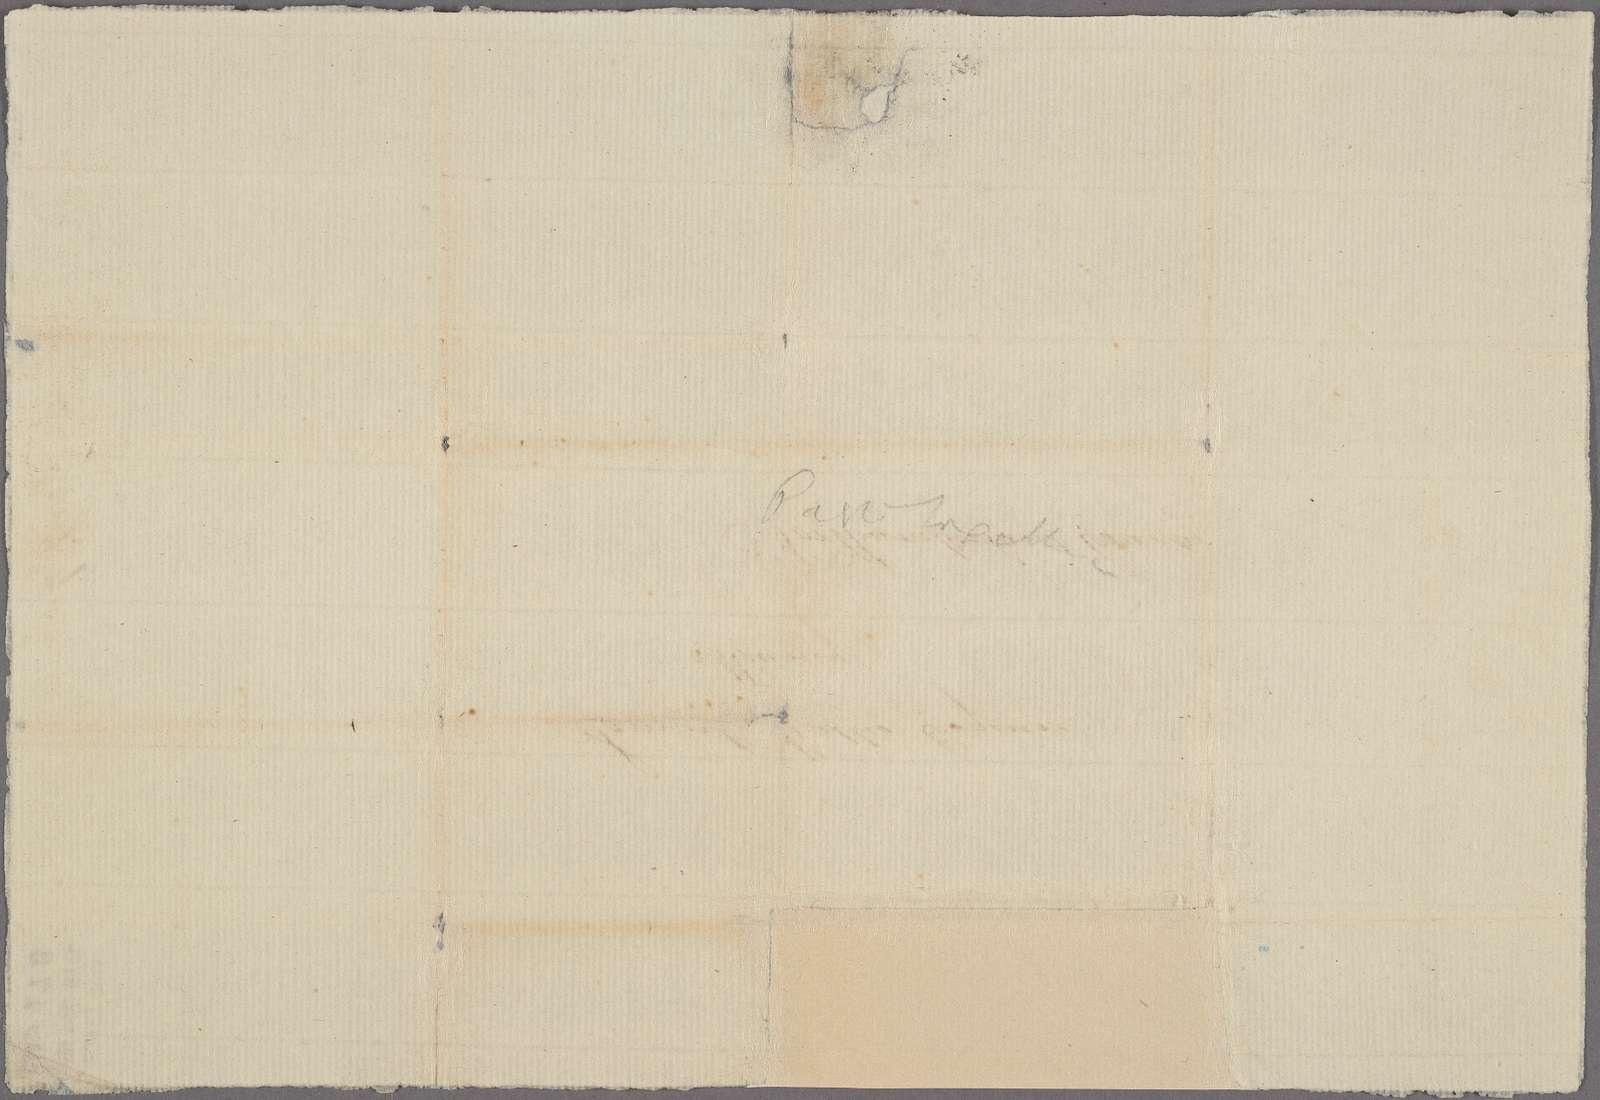 Letter to Samuel Wallis, Muncy, Northumberland County [Penn.]